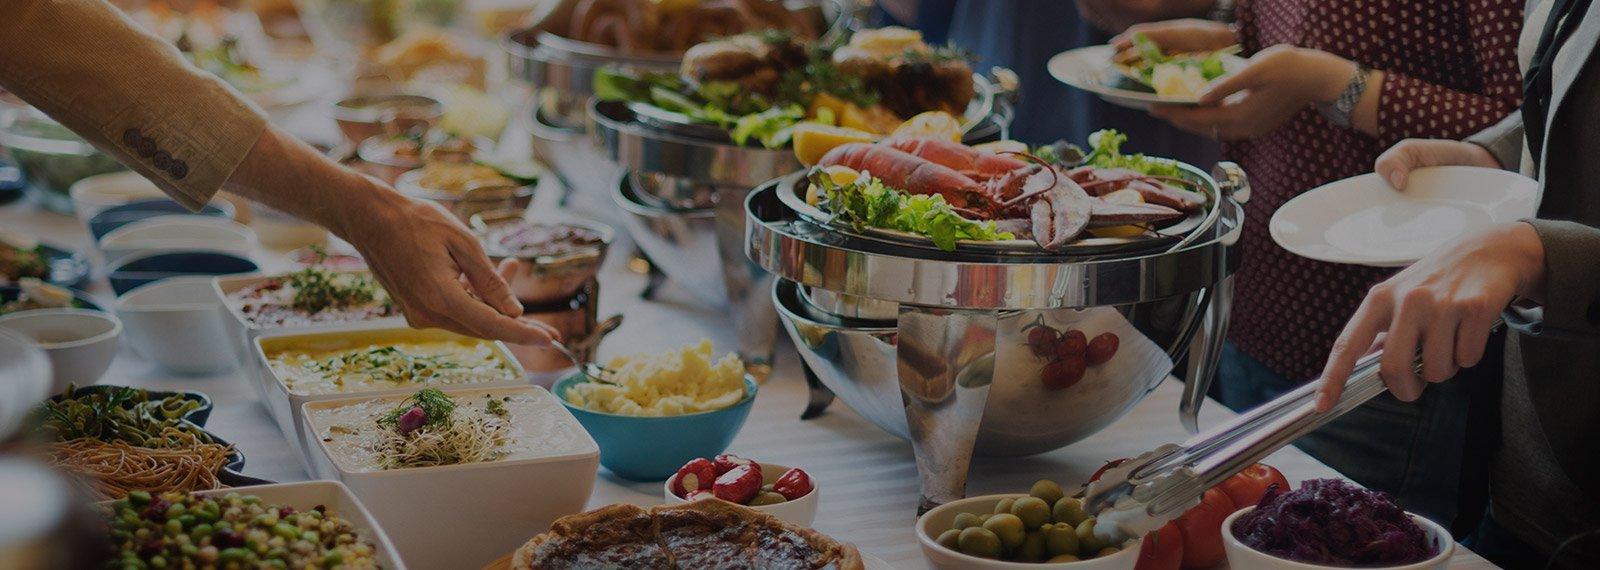 Peachy Proiettis Italian Restaurant Webster Ny Italian Food Interior Design Ideas Helimdqseriescom